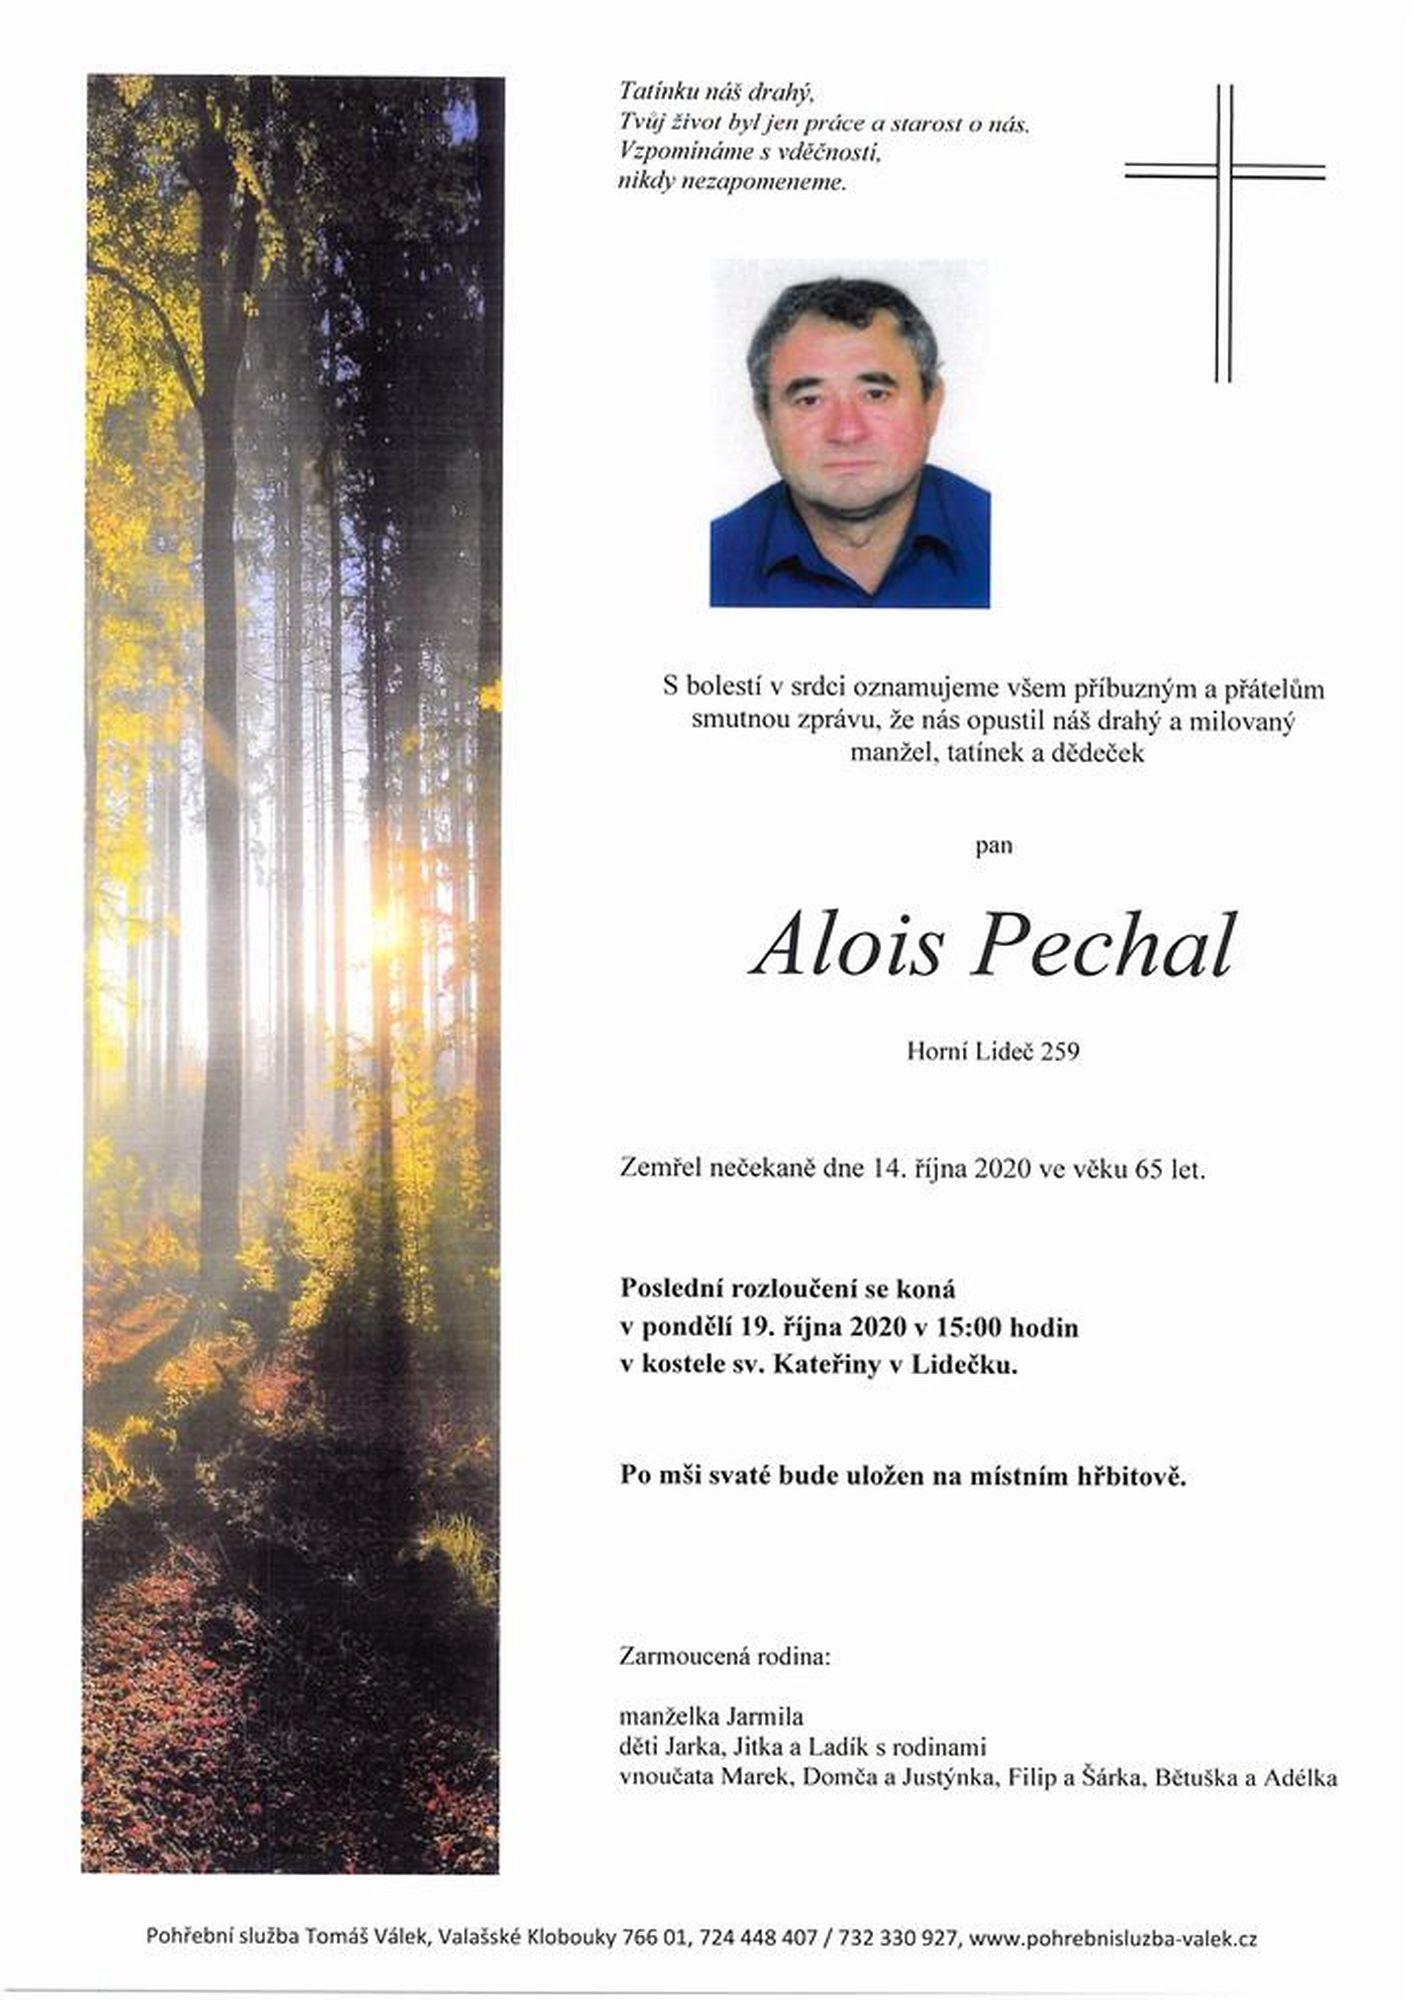 Alois Pechal